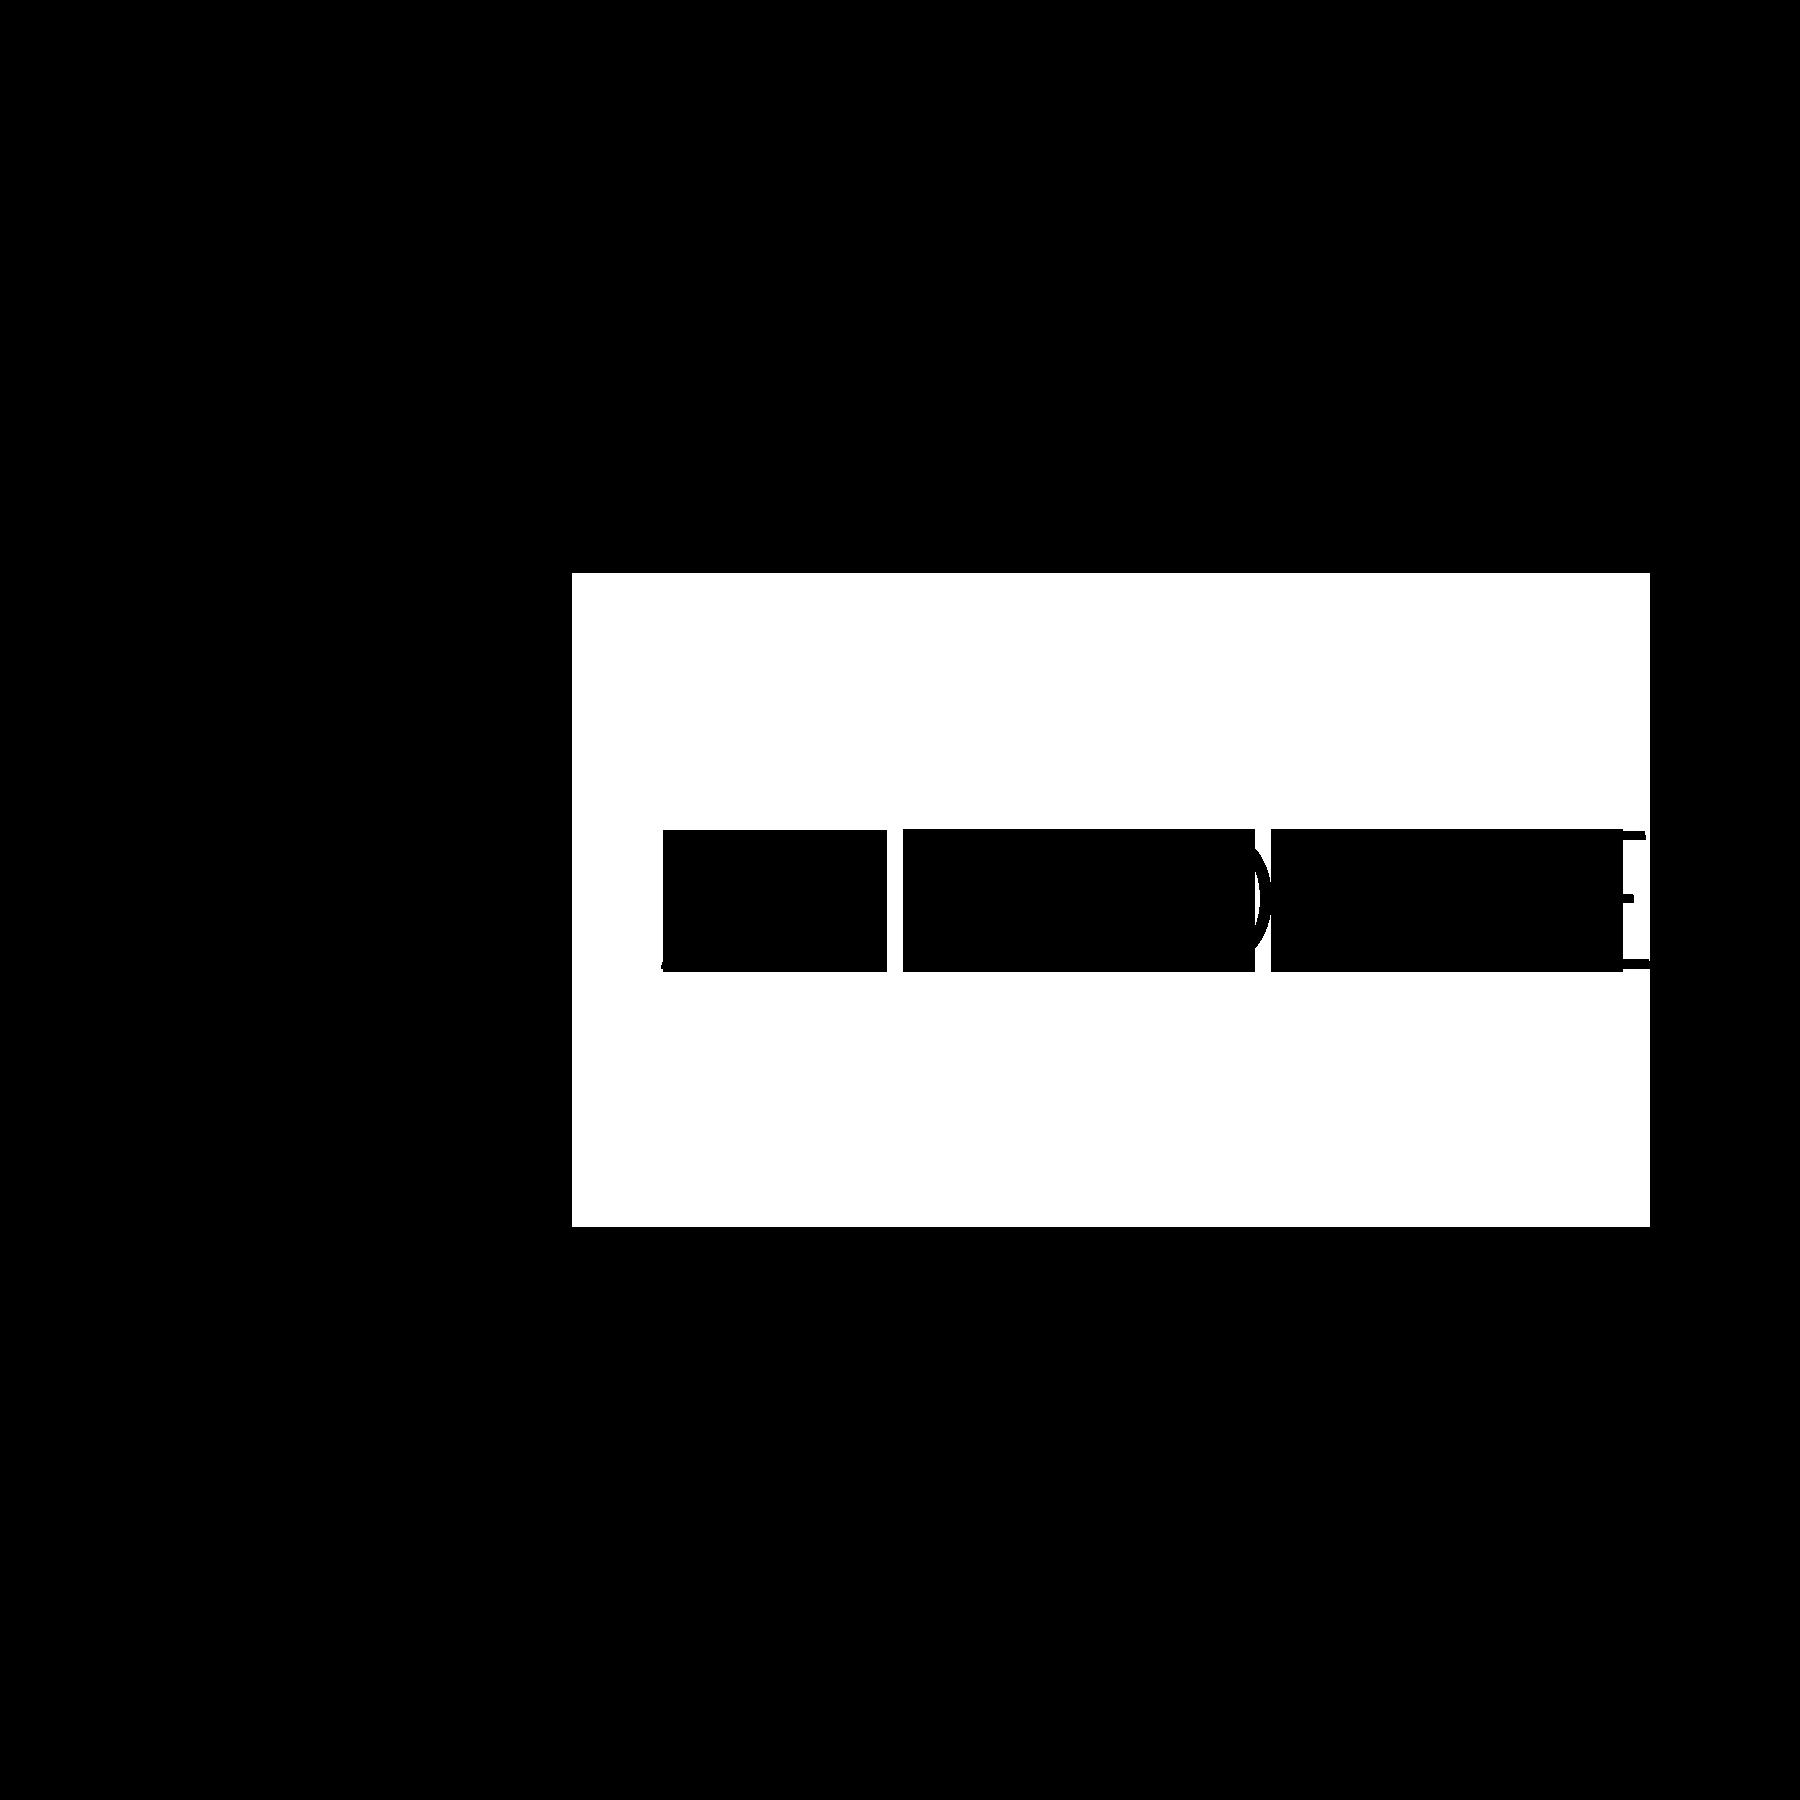 Appiloque Pte. Ltd. company logo